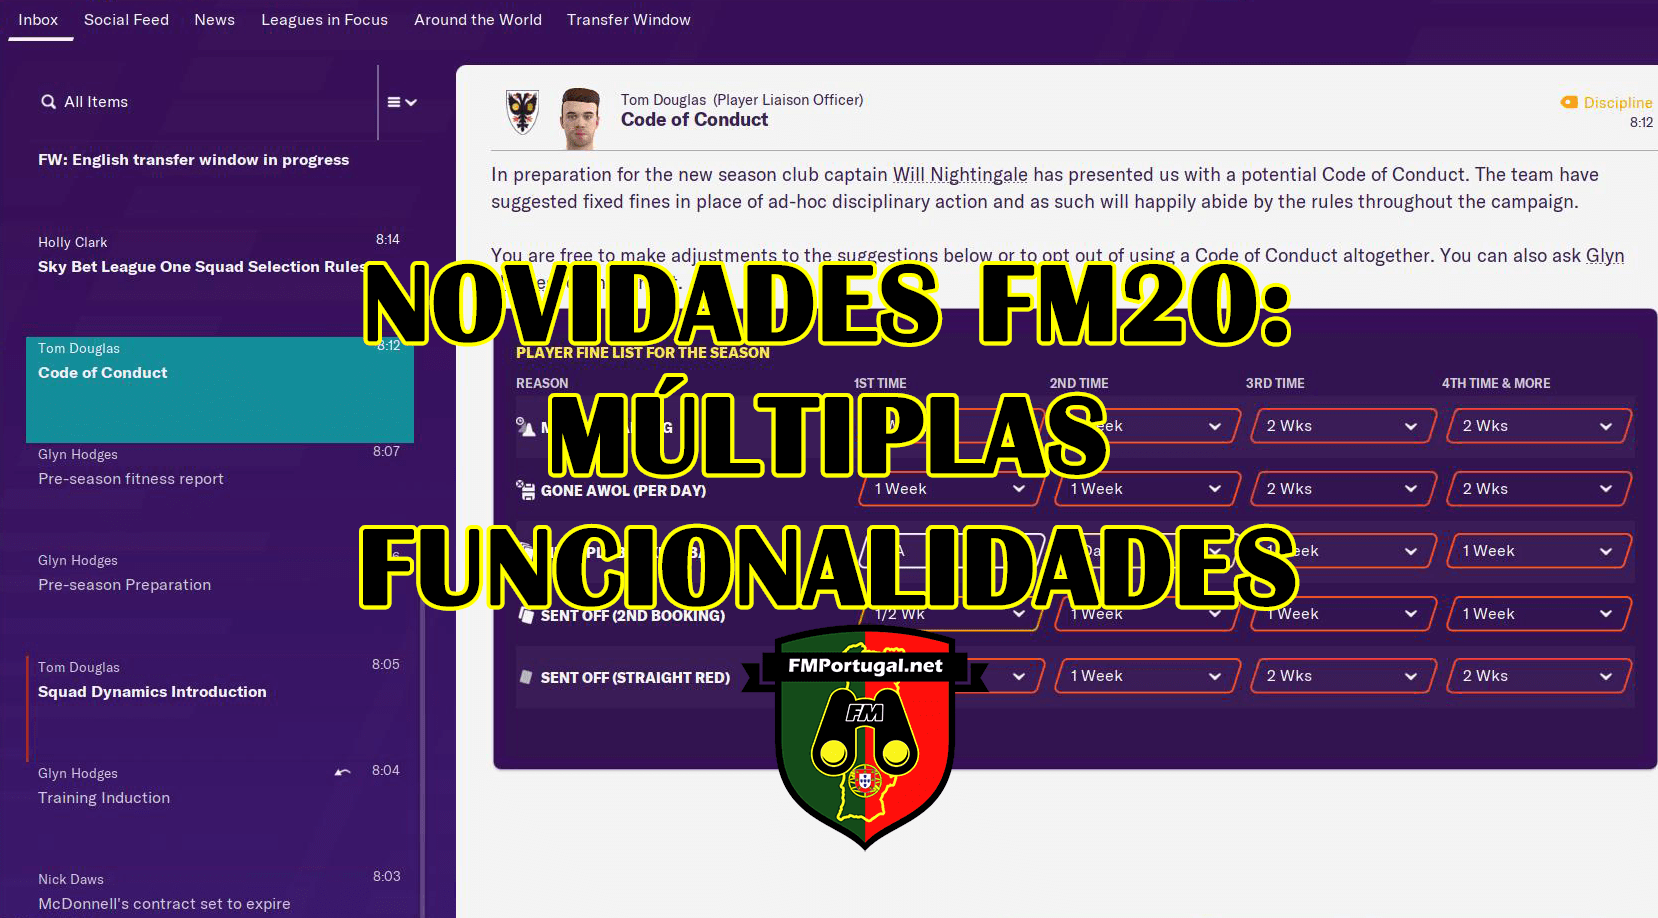 Novidades FM20: Funcionalidades anunciadas no Twitter